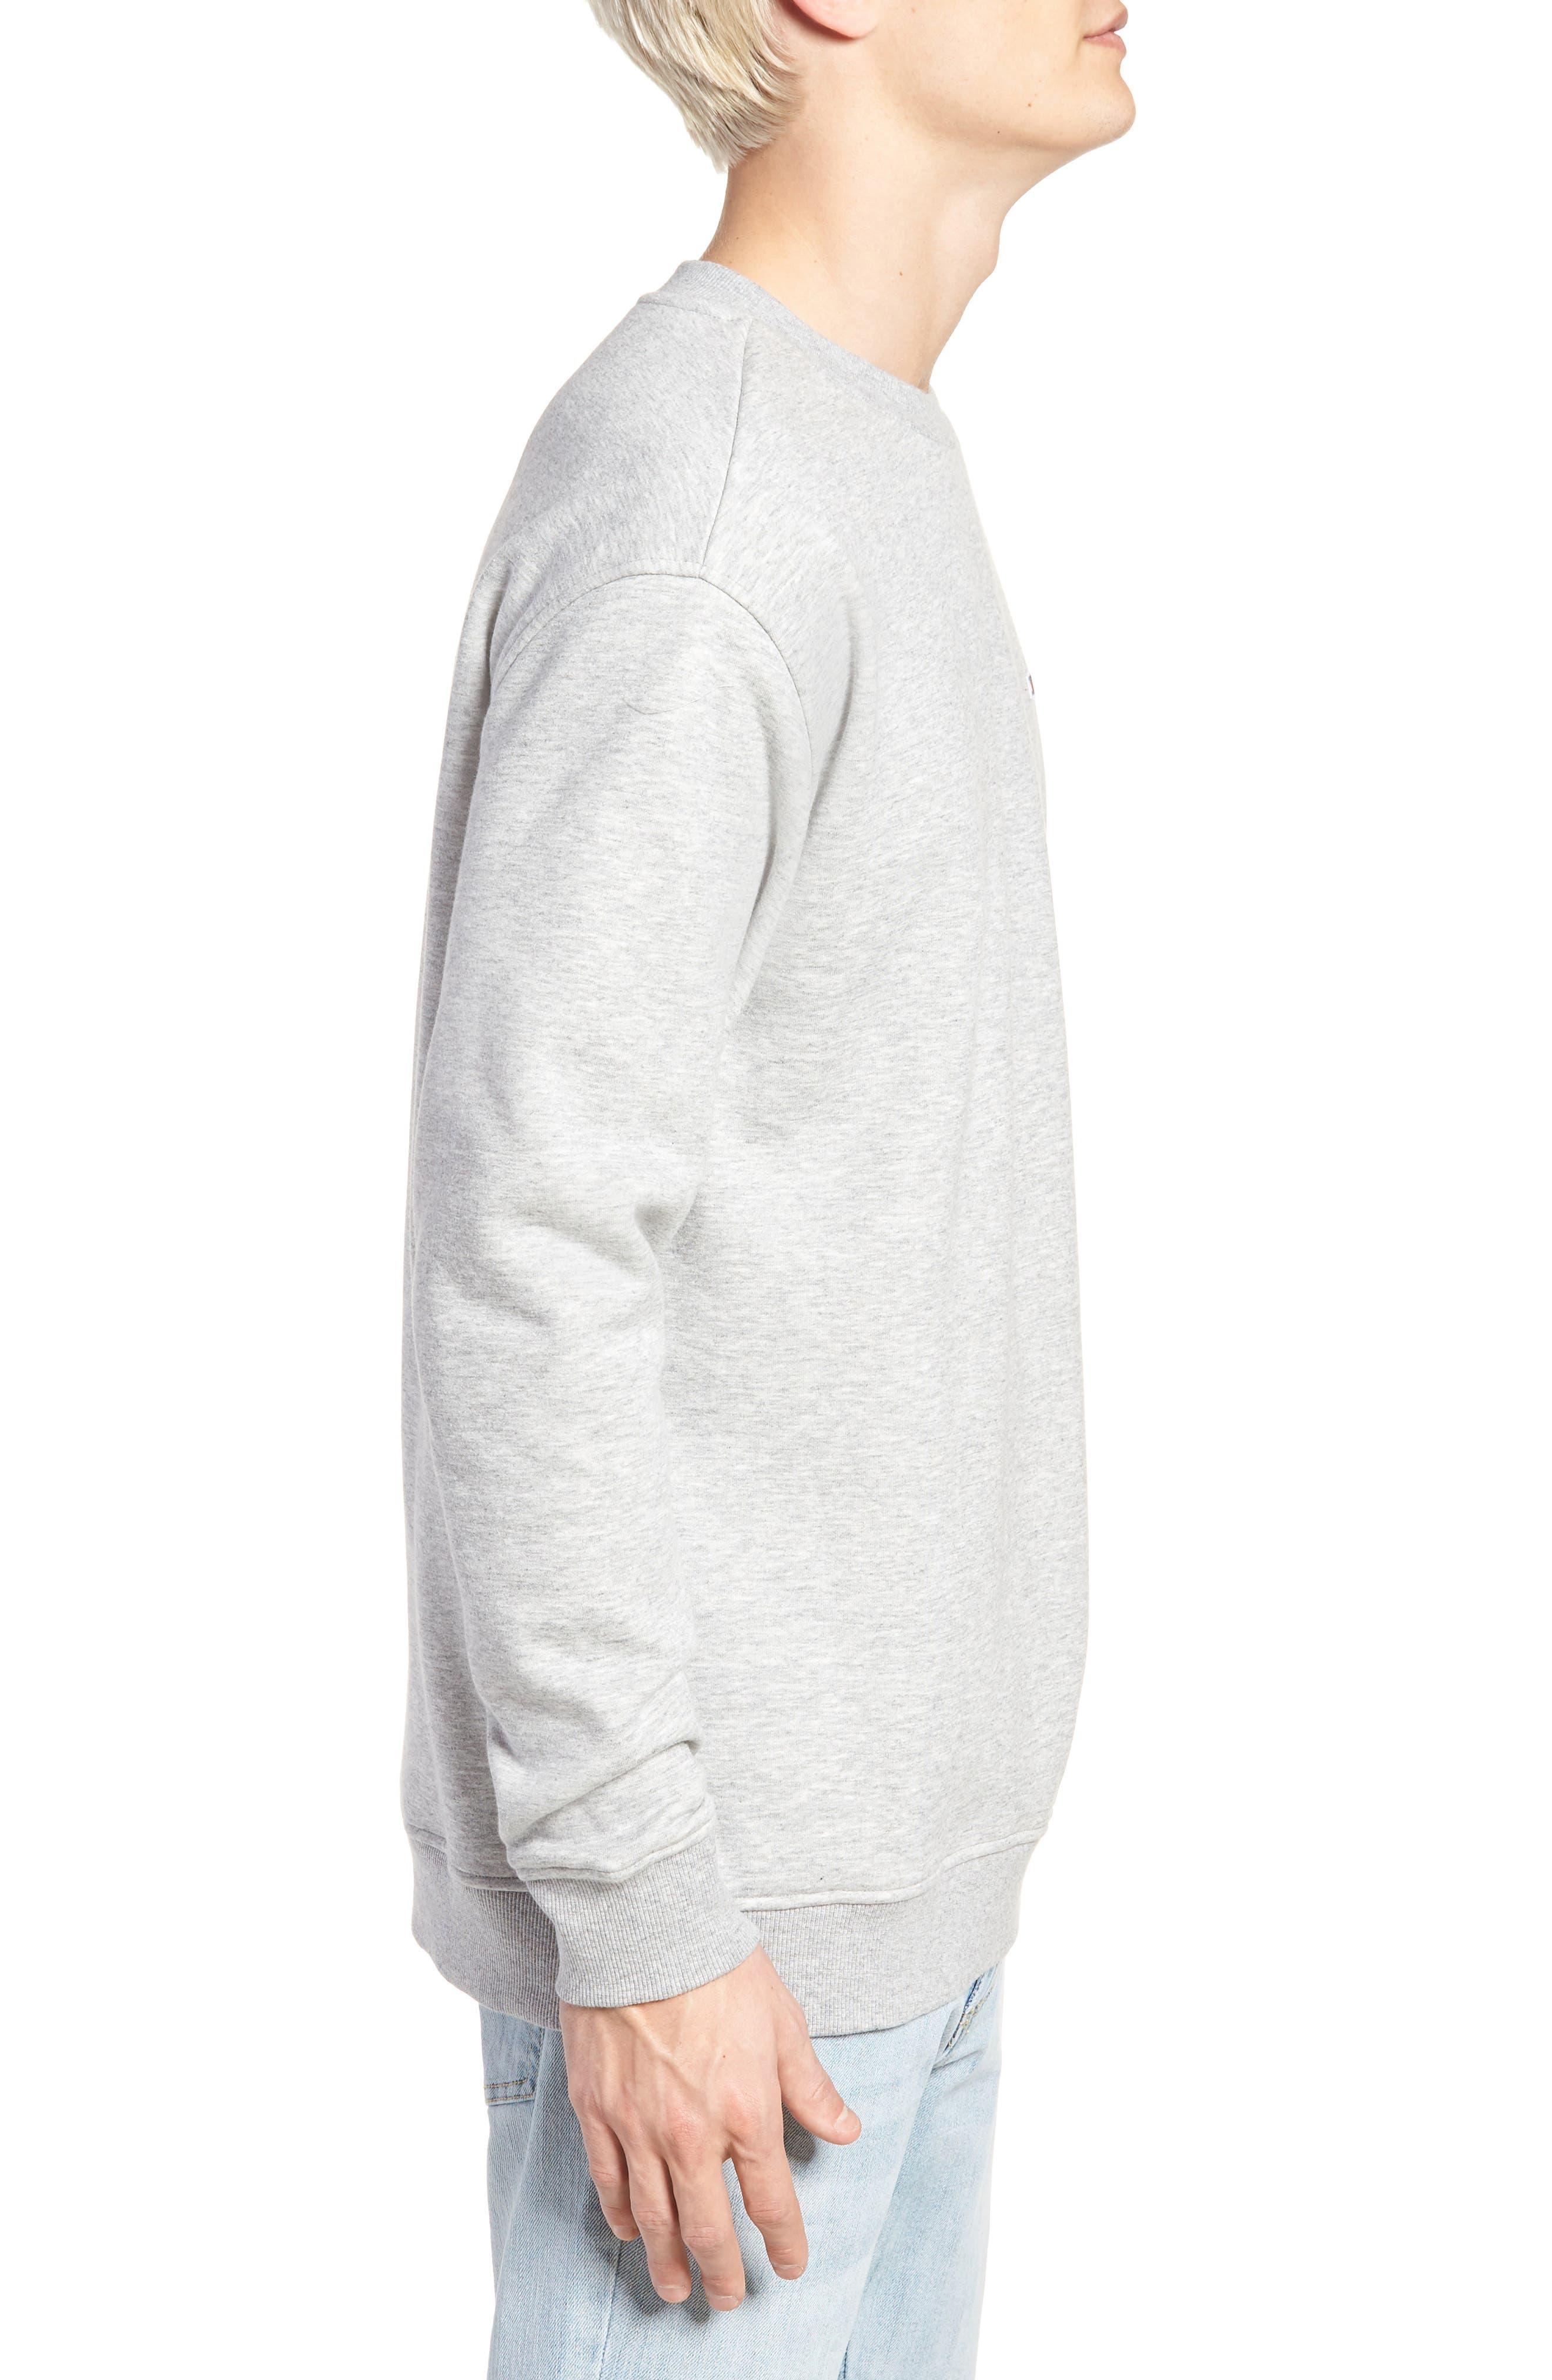 Tommy Classics Crewneck Sweatshirt,                             Alternate thumbnail 3, color,                             LIGHT GREY HEATHER